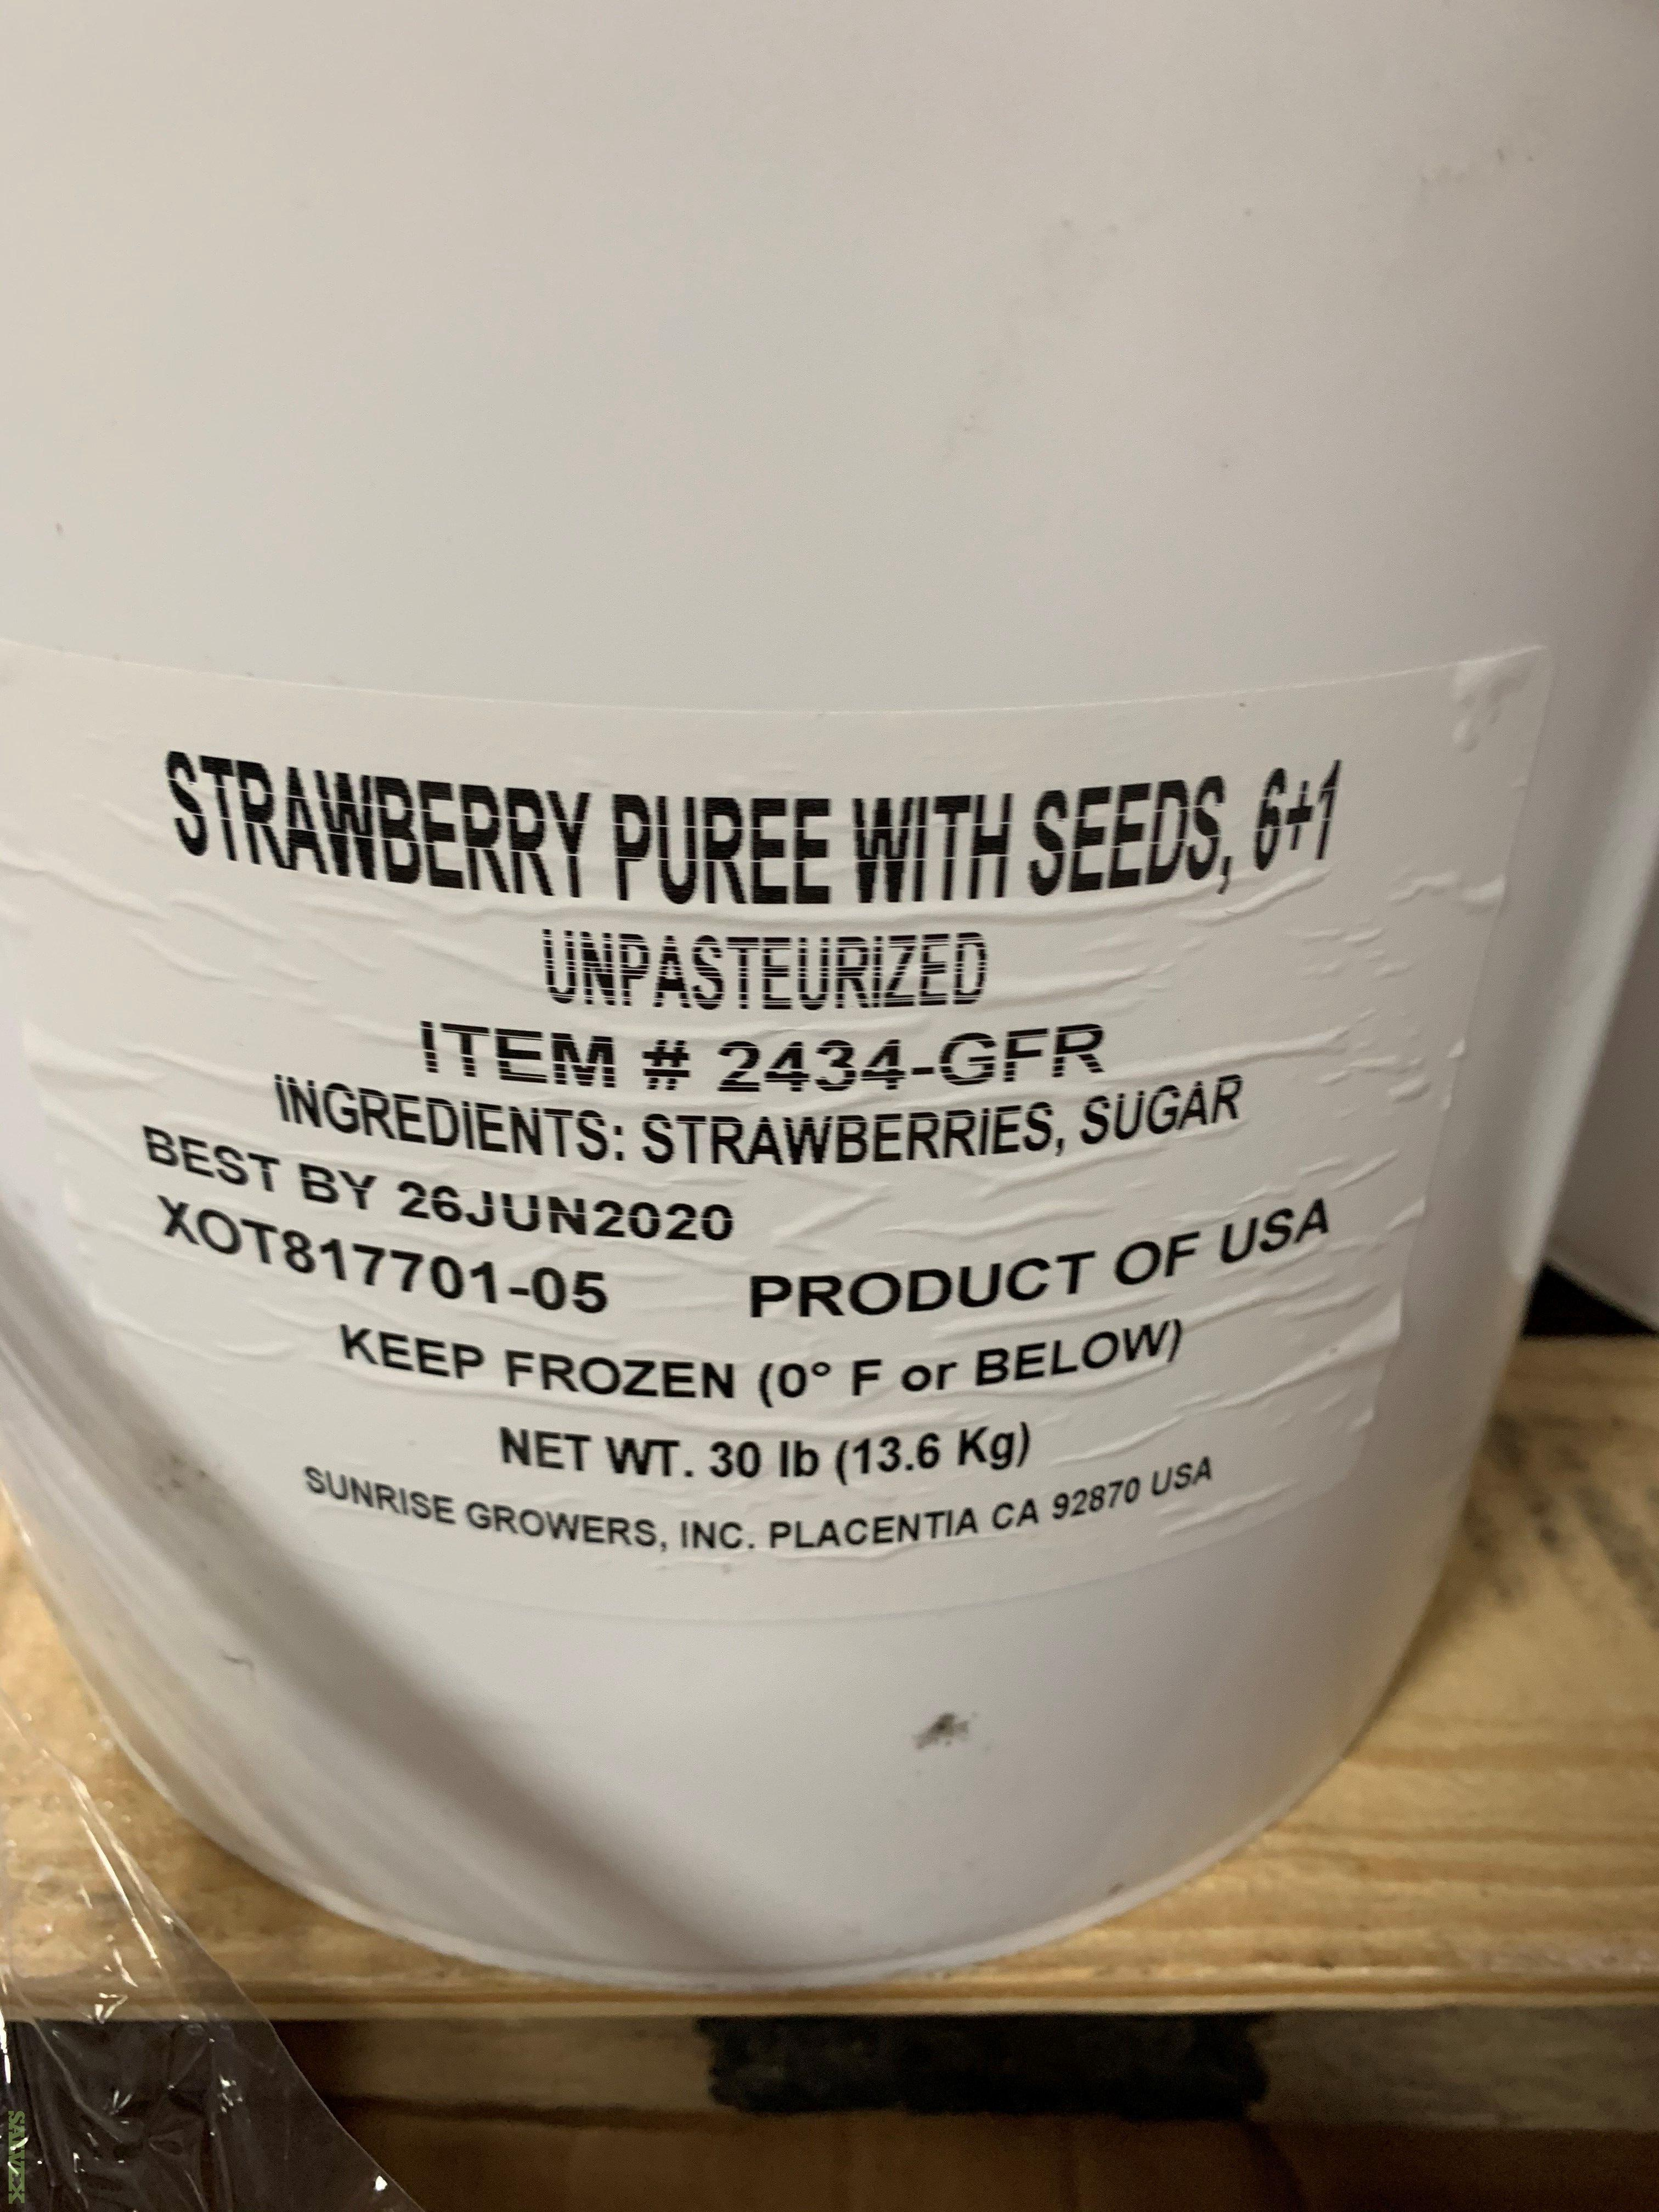 Strawberry Puree w/Seeds 6 1 (1,250 Buckets - 37,500)